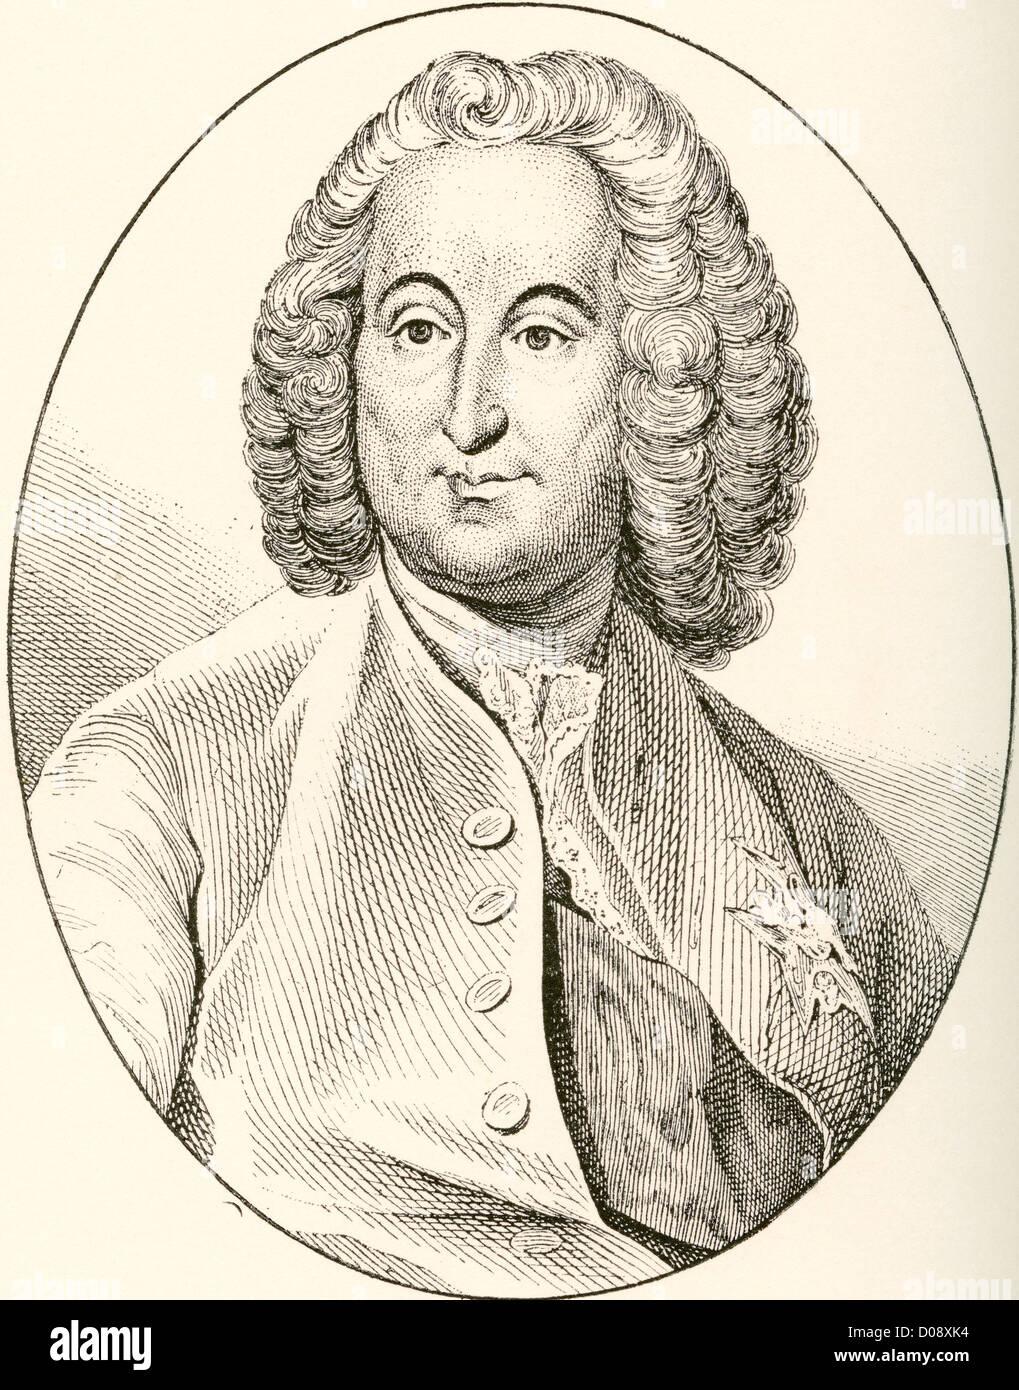 Antoine-Louis Rouillé, comte de Jouy-en-Josas, 1689–1761. French statesman. - Stock Image